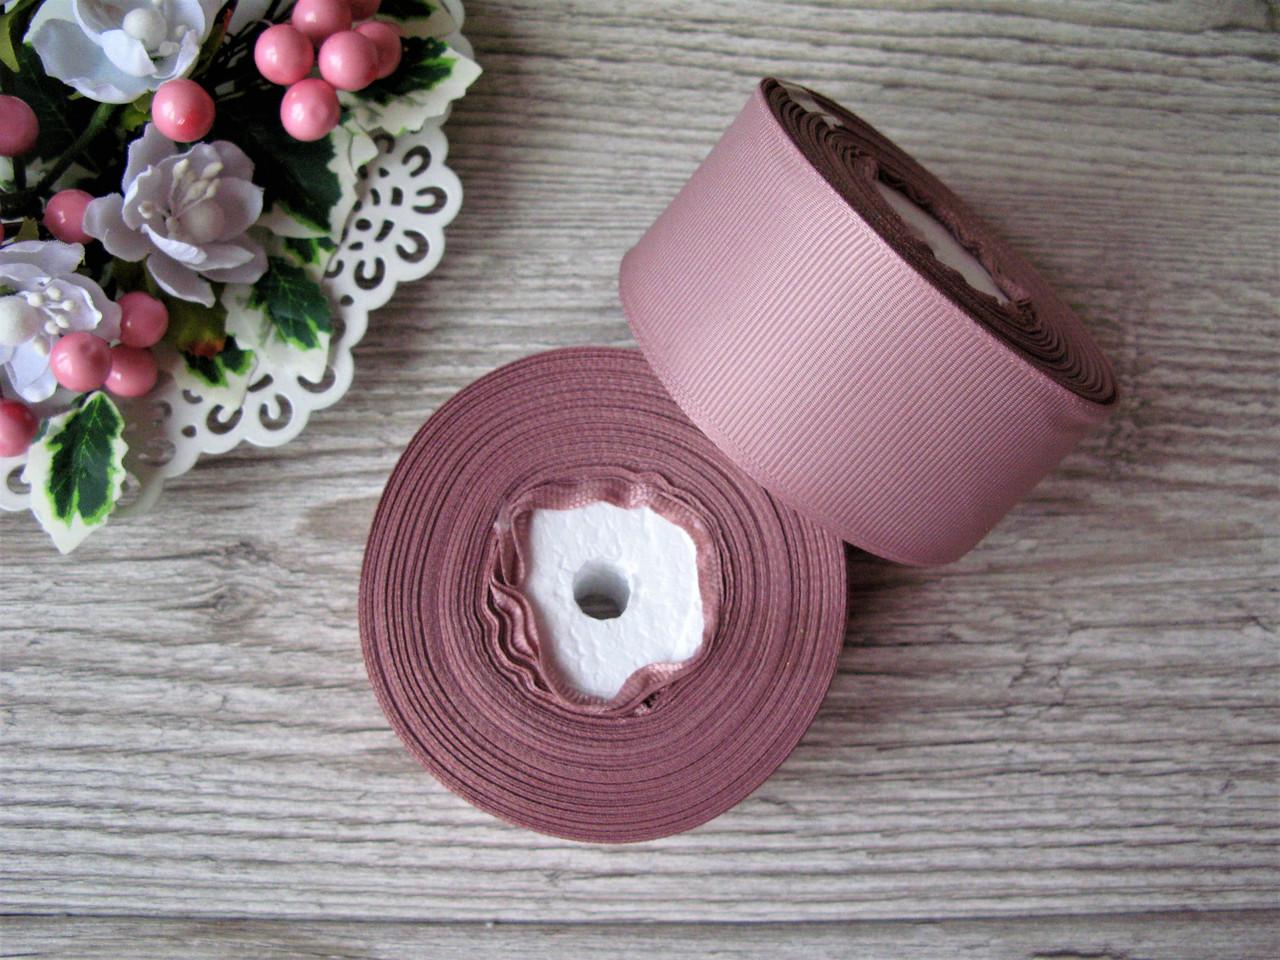 Лента репсовая 4 см розово-бежевый, бобина 18 м - 51 грн